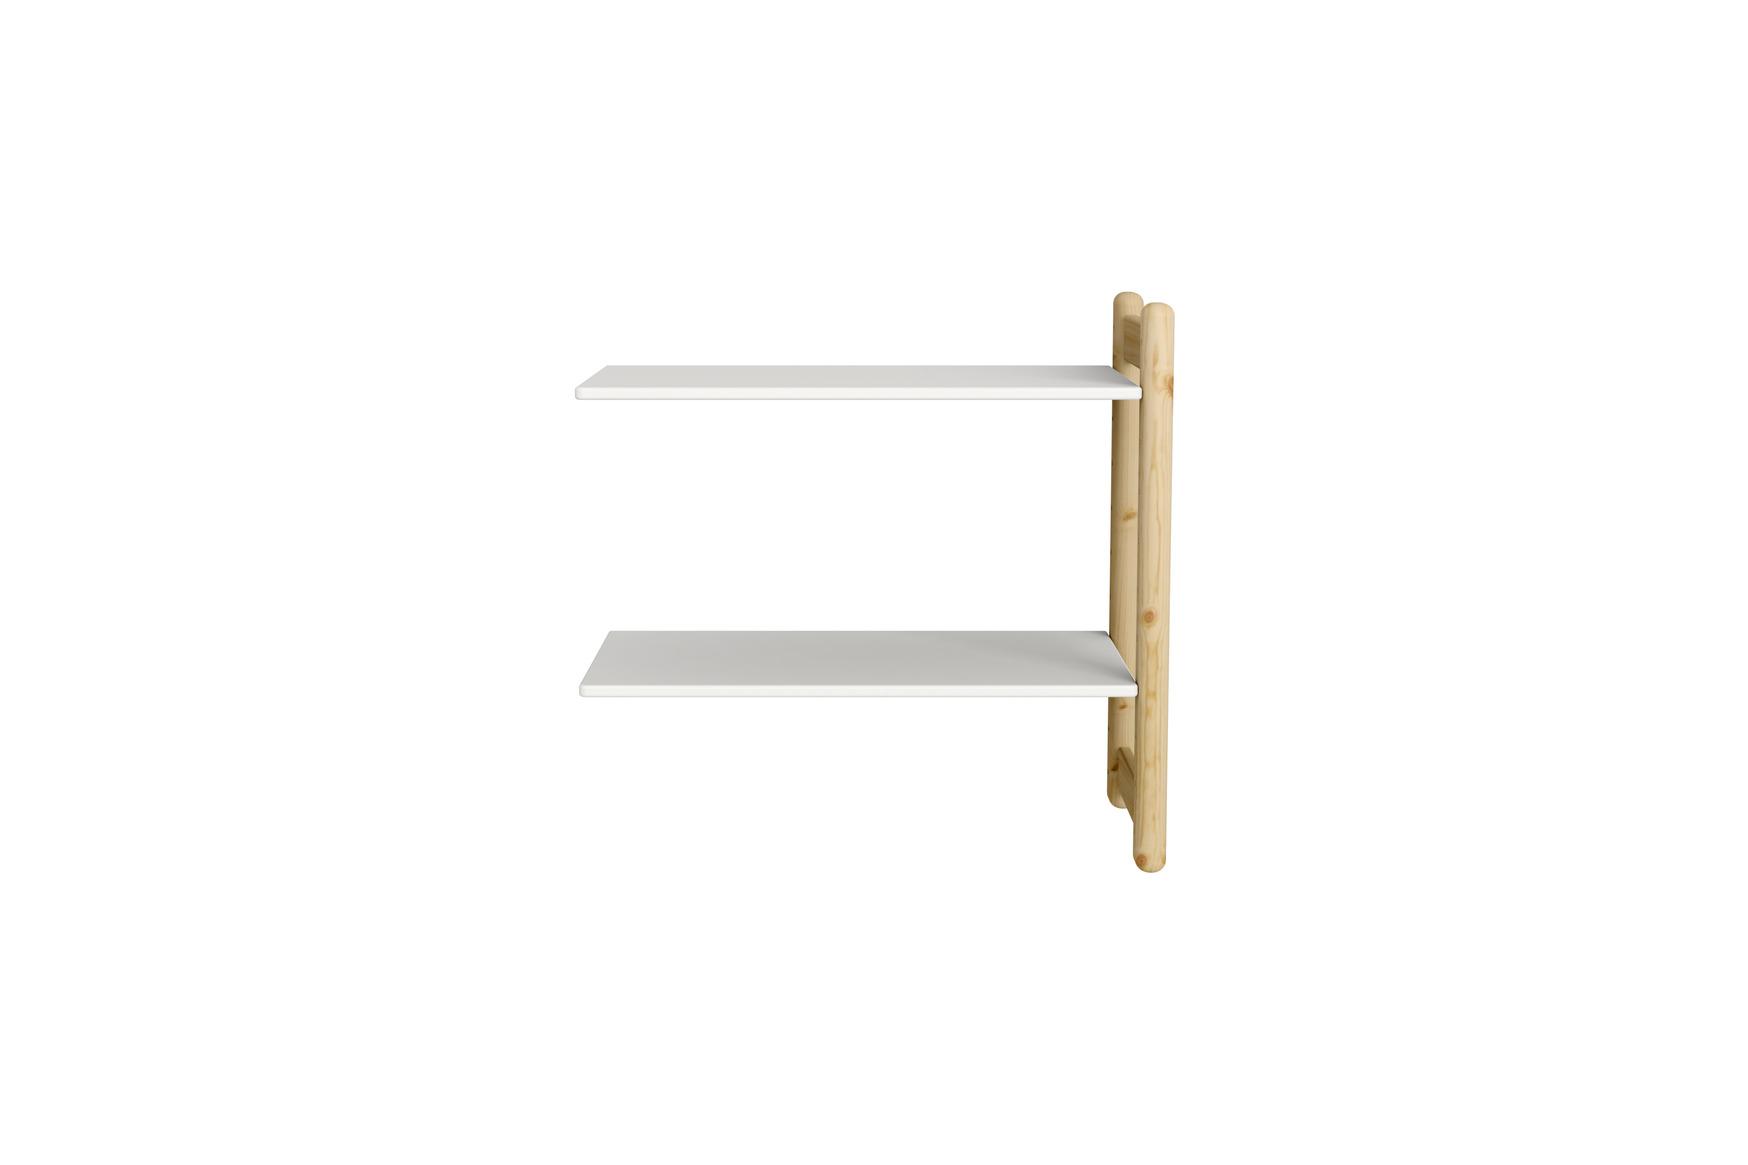 flexa regalerweiterung shelfie dannenfelser. Black Bedroom Furniture Sets. Home Design Ideas